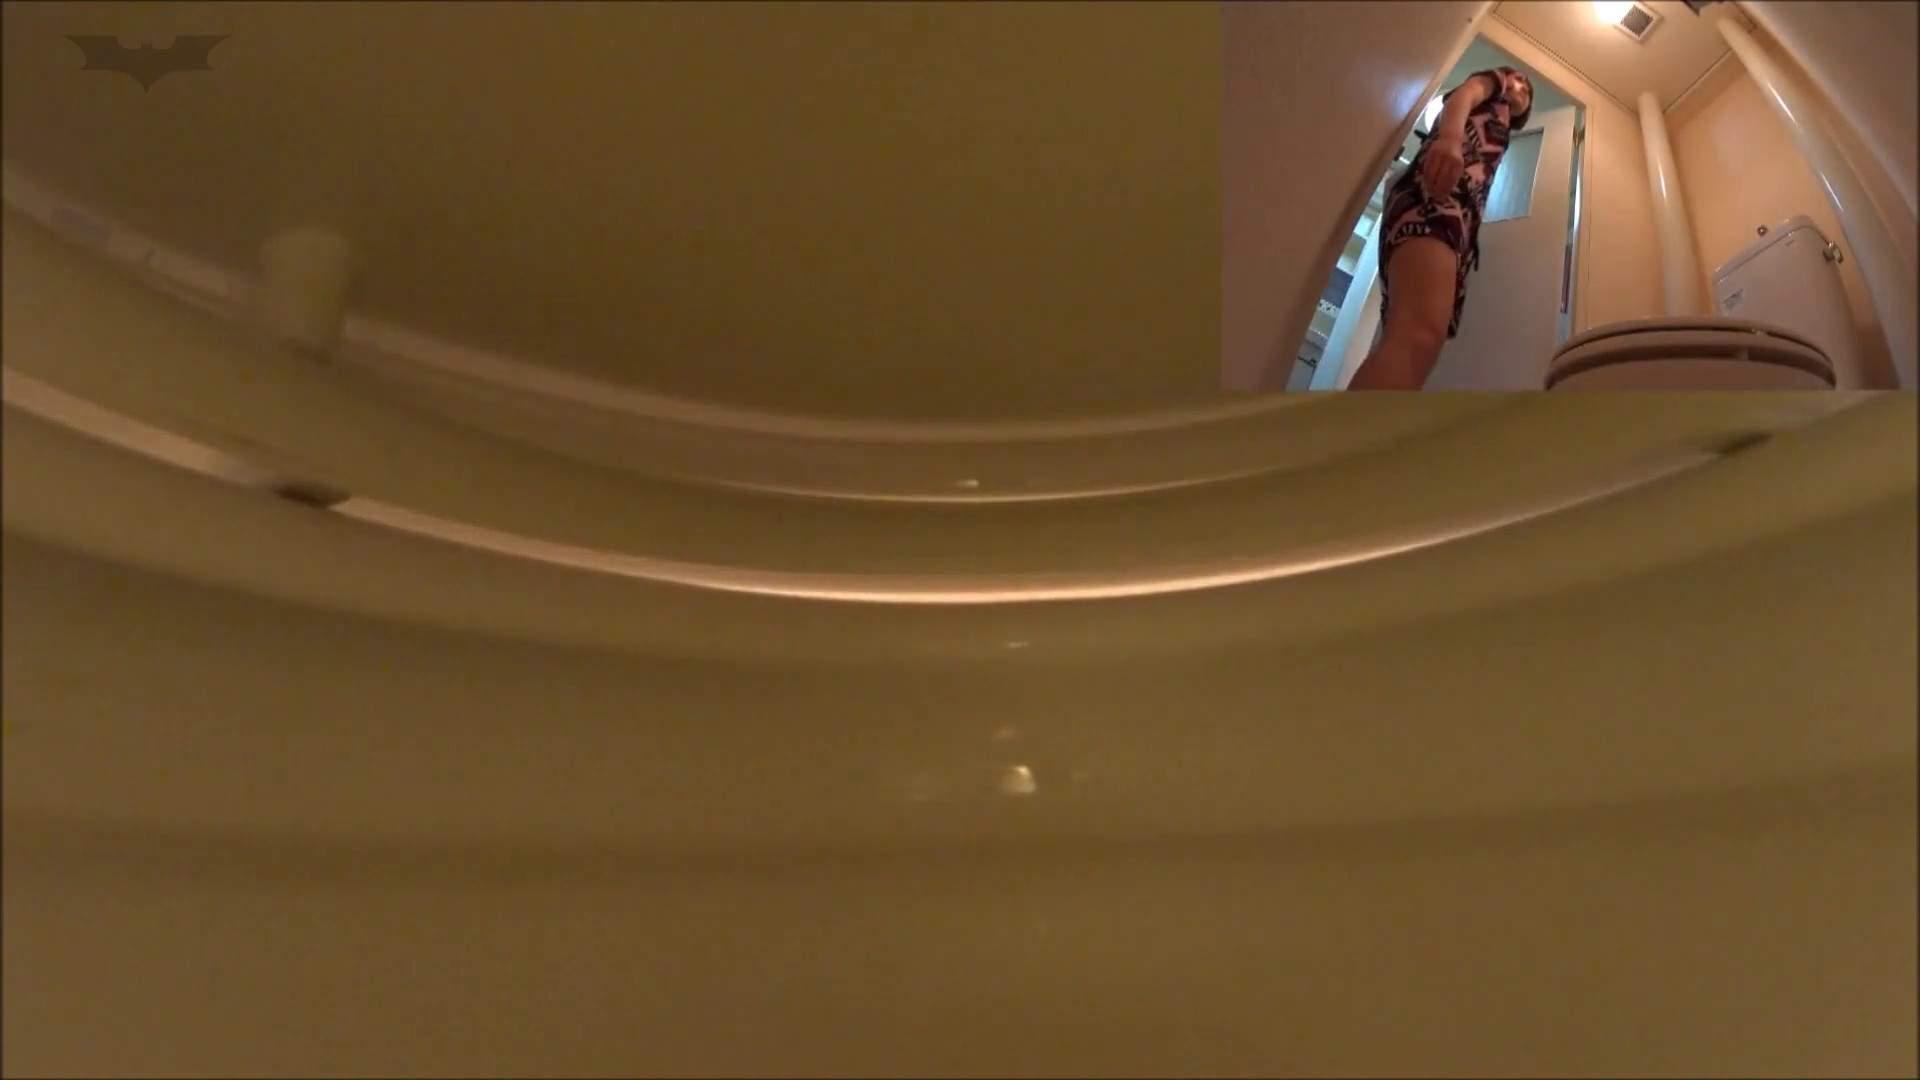 vol.01[洗面所]実はコレが目的でした。-安堵でブリブリ垂れ流す女子大生- 洗面所  50pic 36